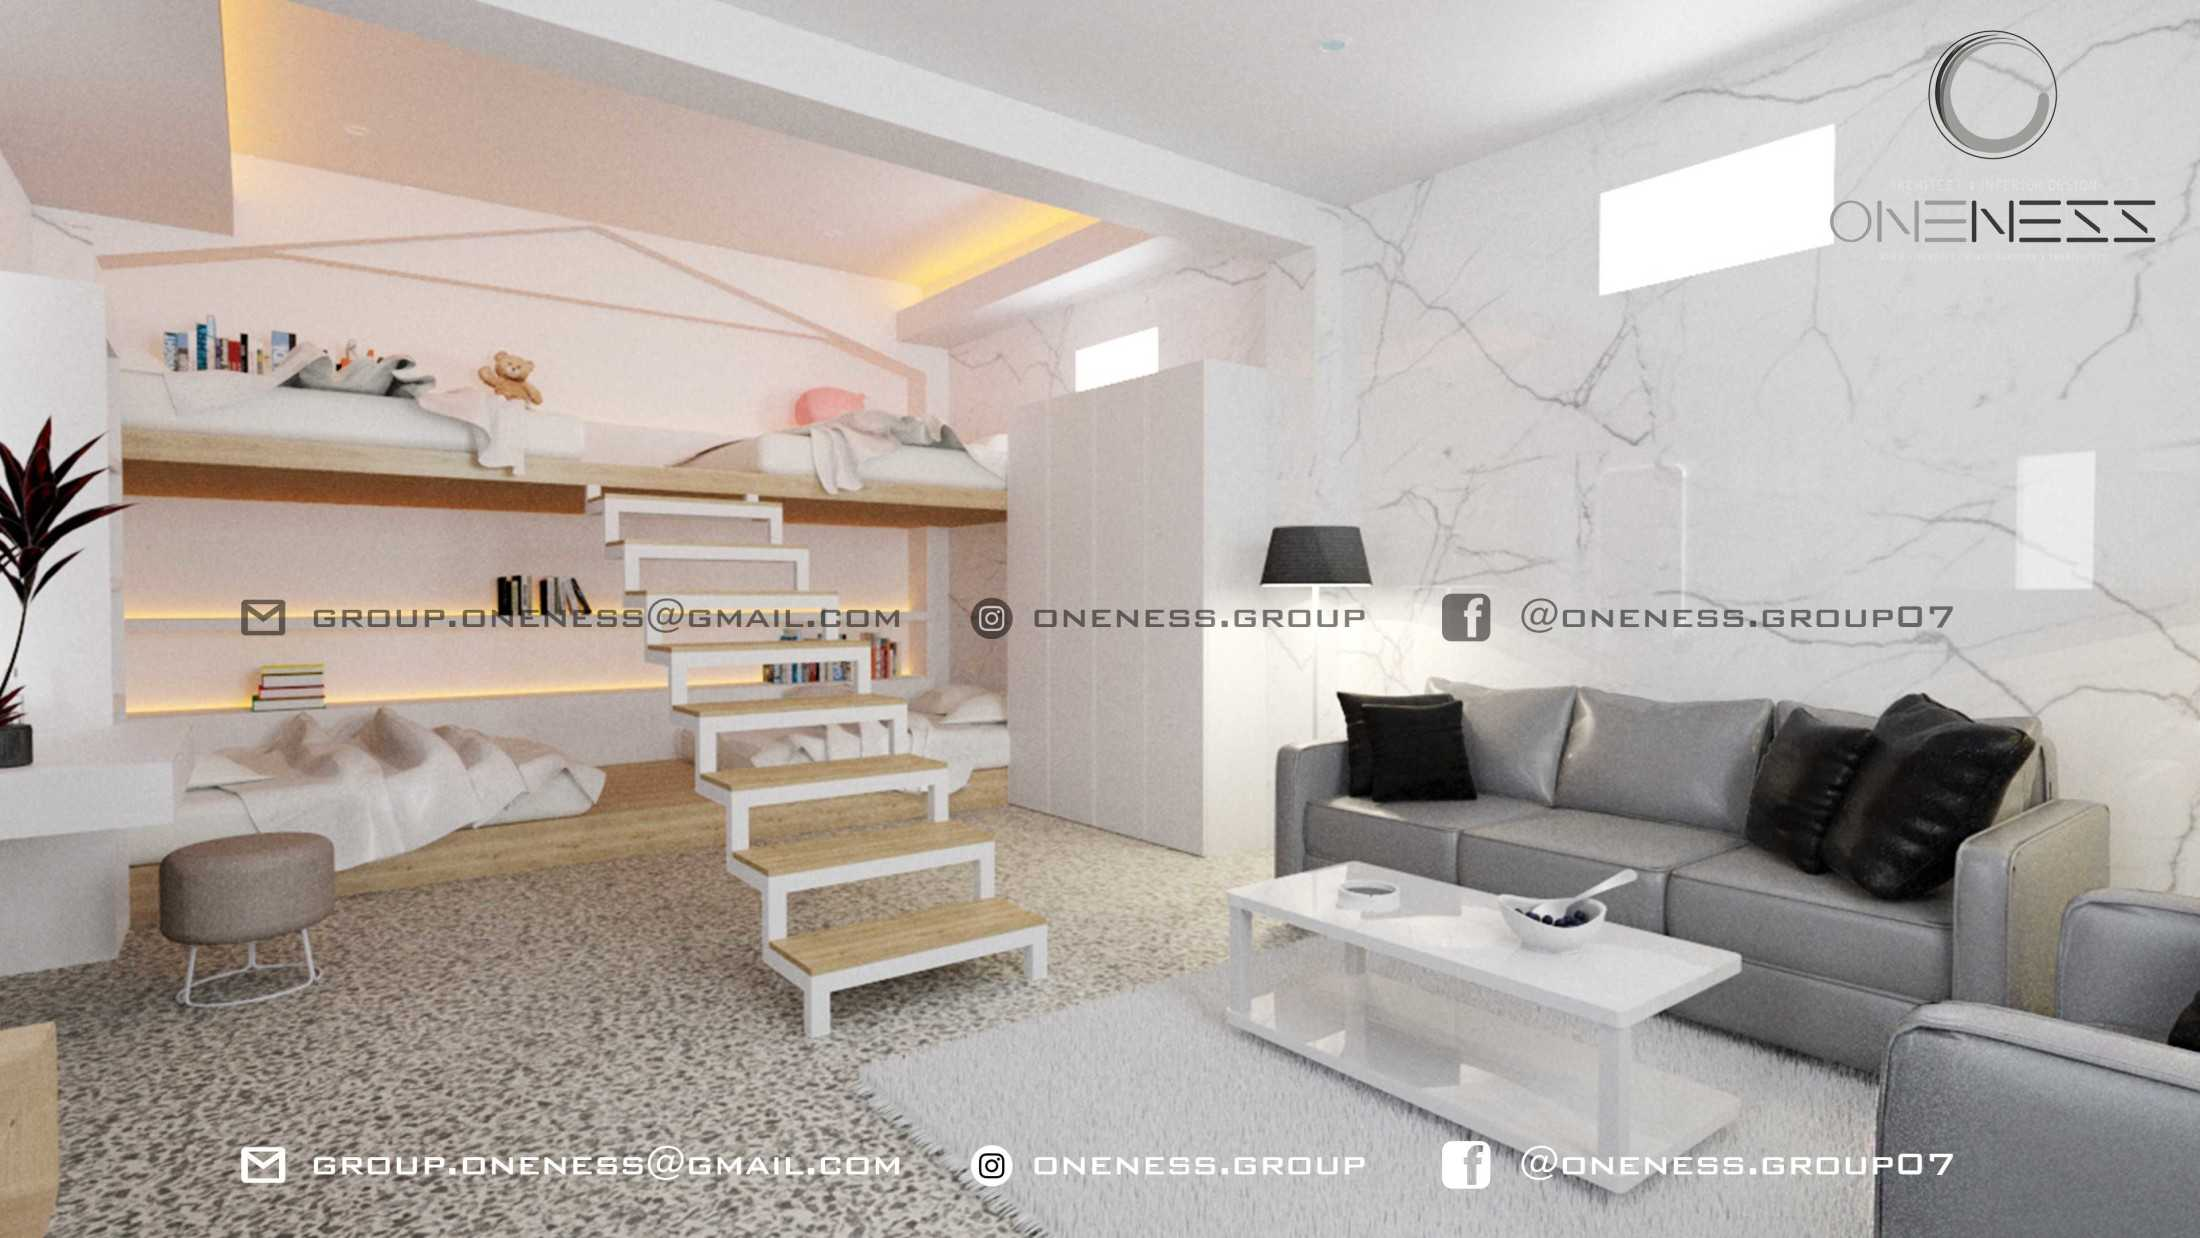 Oneness Group Rumah Toko Minimalis Cirebon Cirebon, Kota Cirebon, Jawa Barat, Indonesia Cirebon, Kota Cirebon, Jawa Barat, Indonesia Kamar Tamu  98605